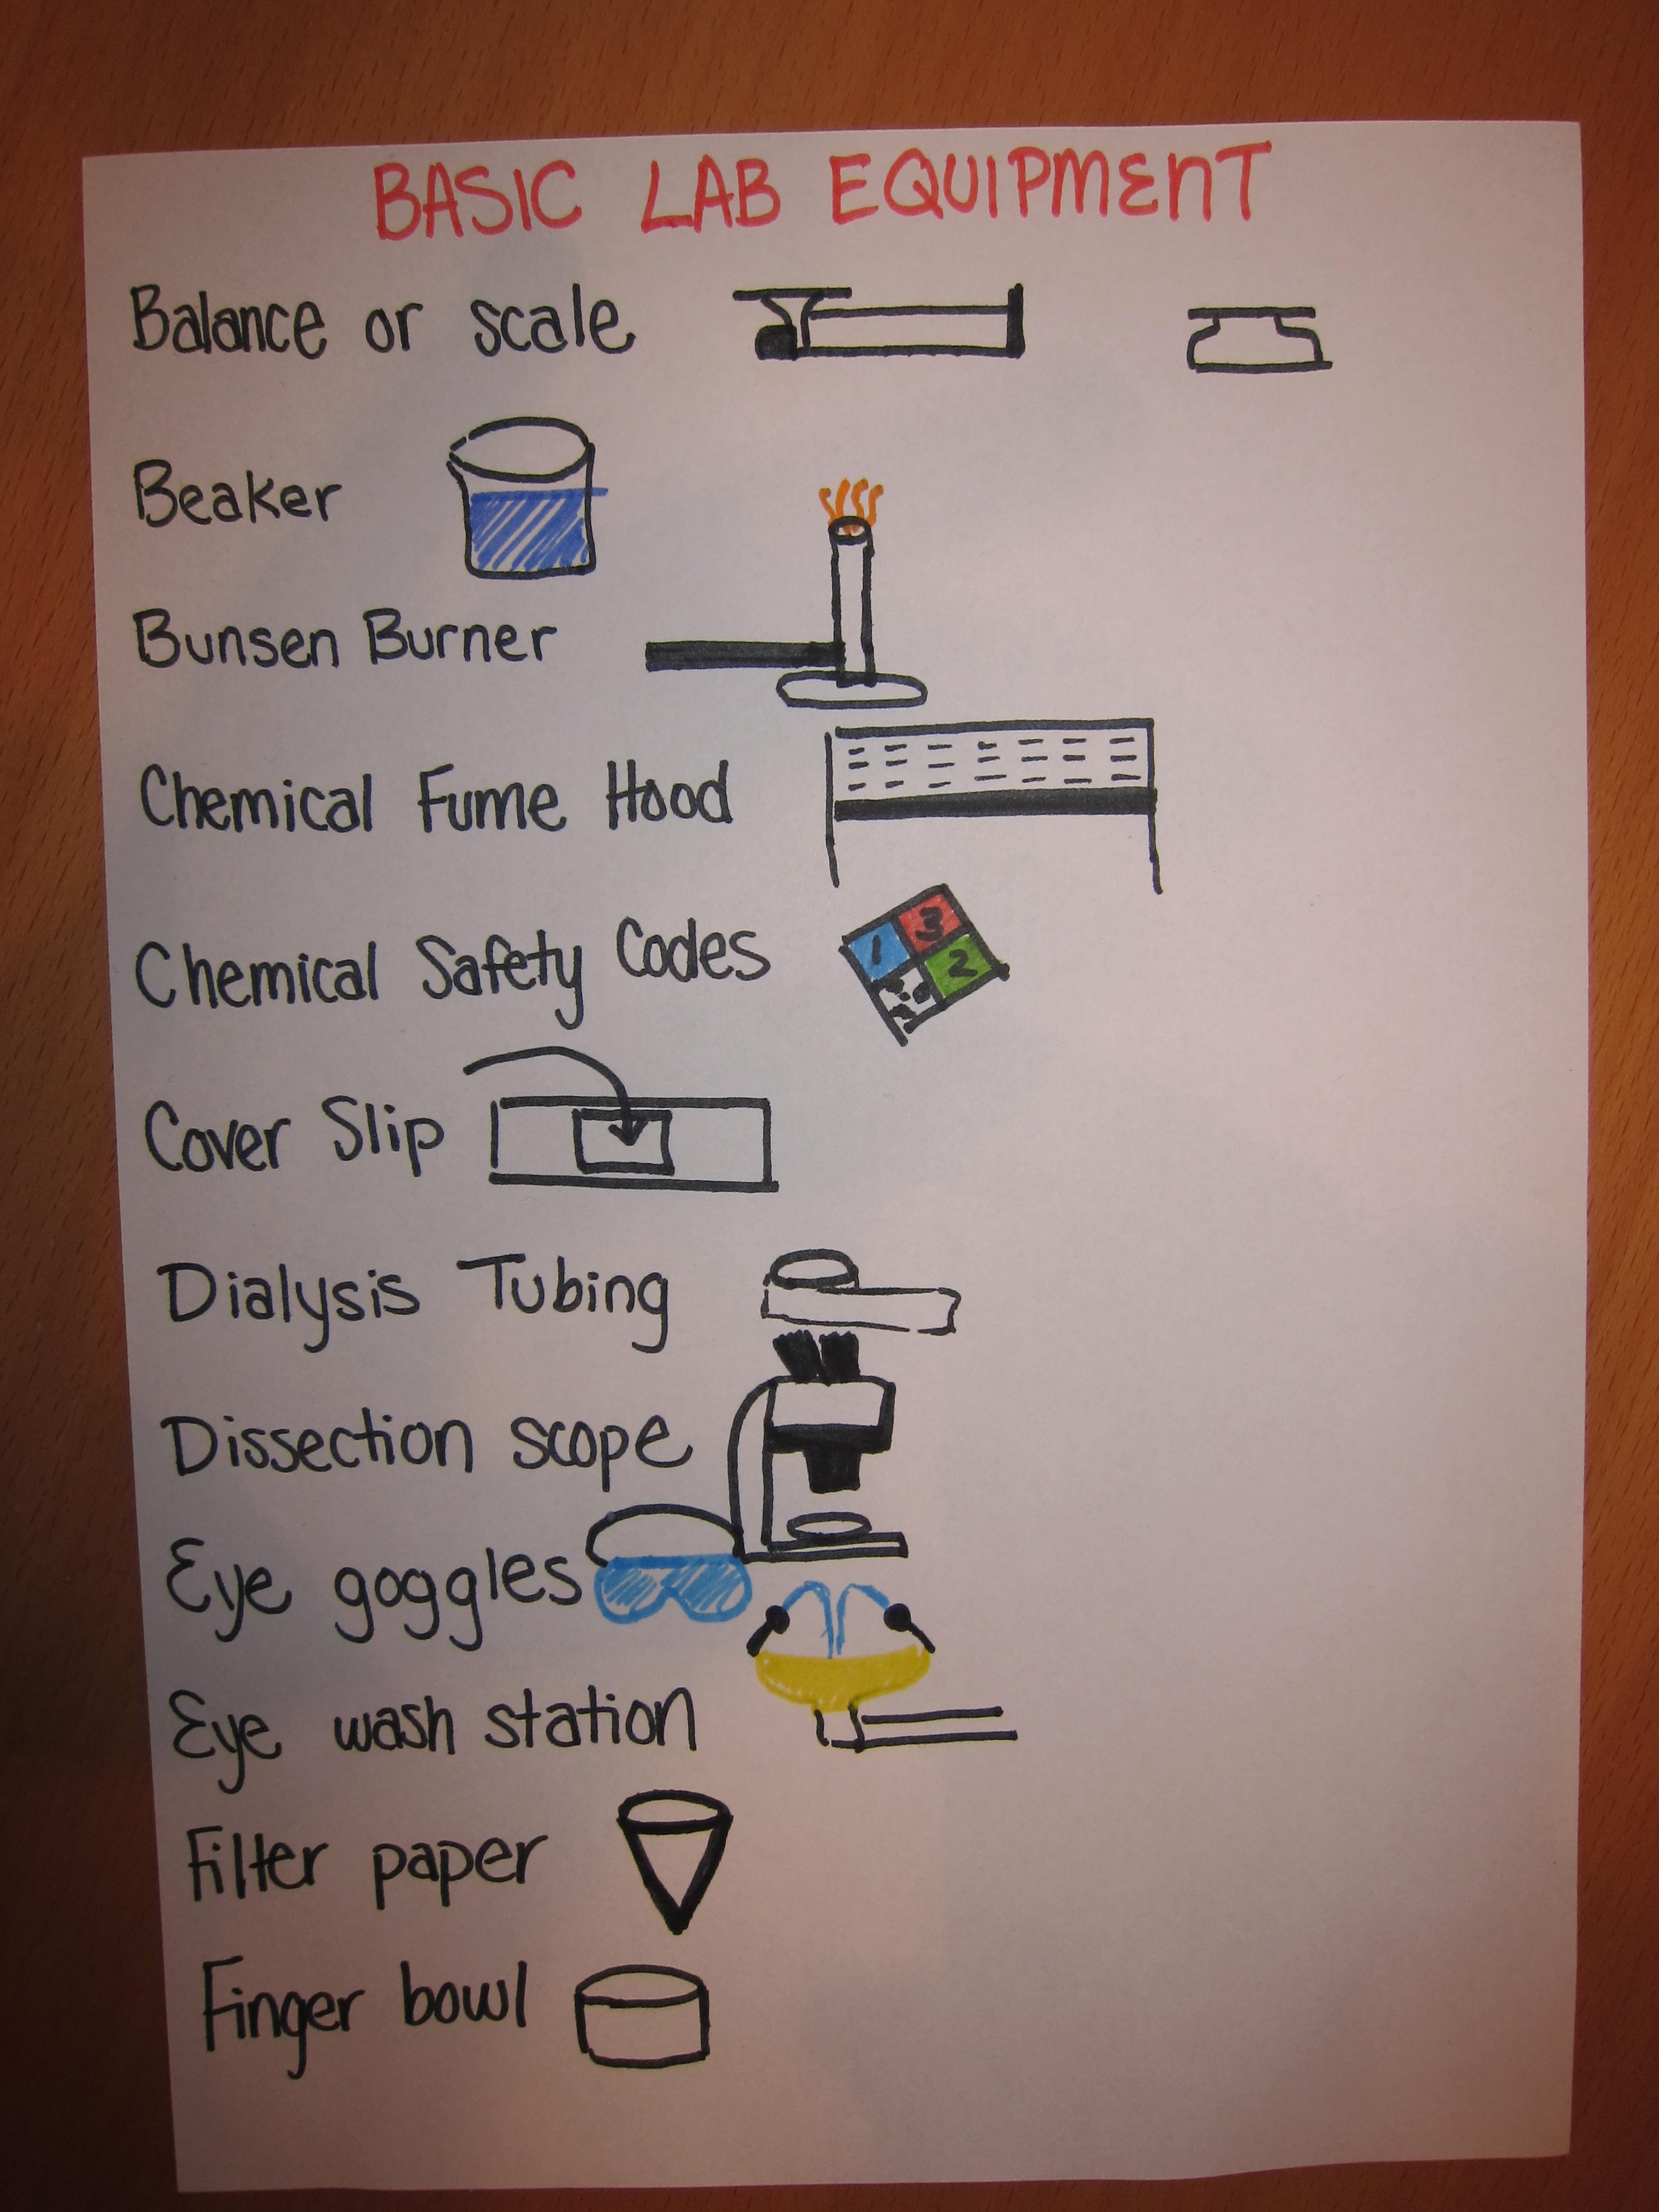 Basic Lab Equipment